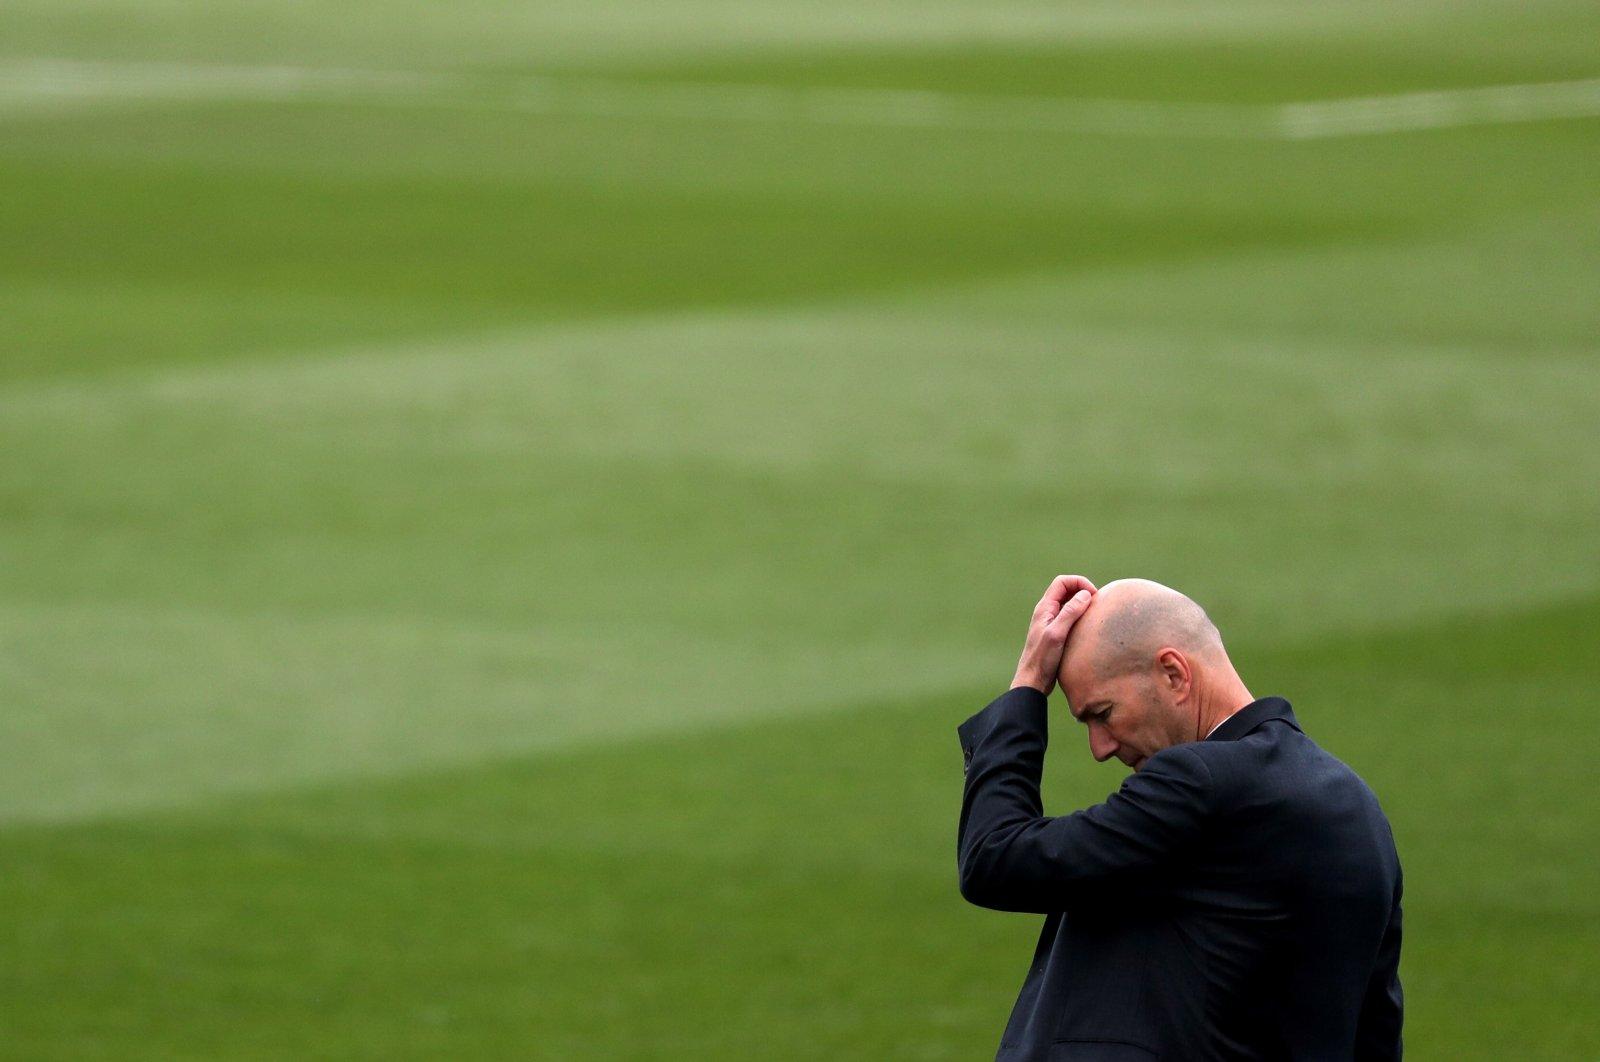 Real Madrid coach Zinedine Zidane during a La Liga match against Villarreal at Estadio Alfredo Di Stefano, Madrid, Spain, May 22, 2021. (Reuters Photo)